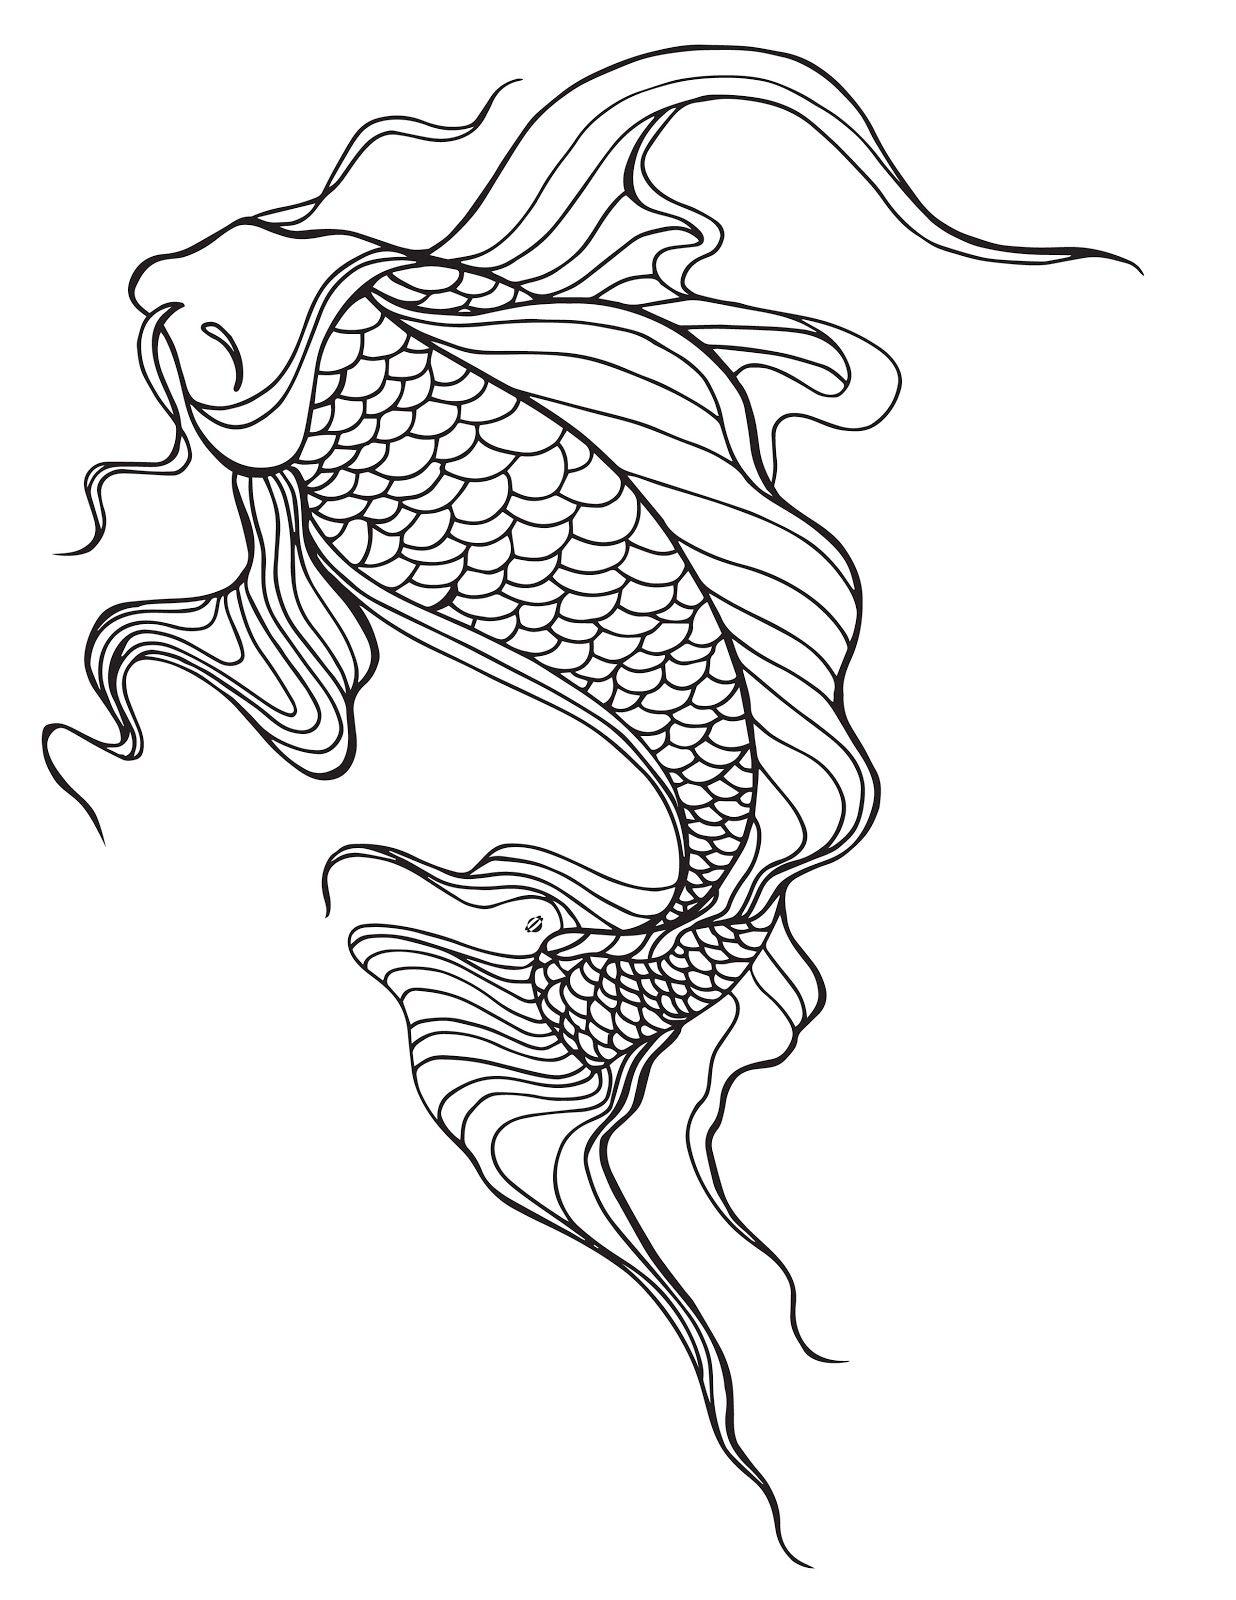 Lostbumblebee Mdbn Grown Up Colouring Coloring Sheets Koi Fish Free Donate To